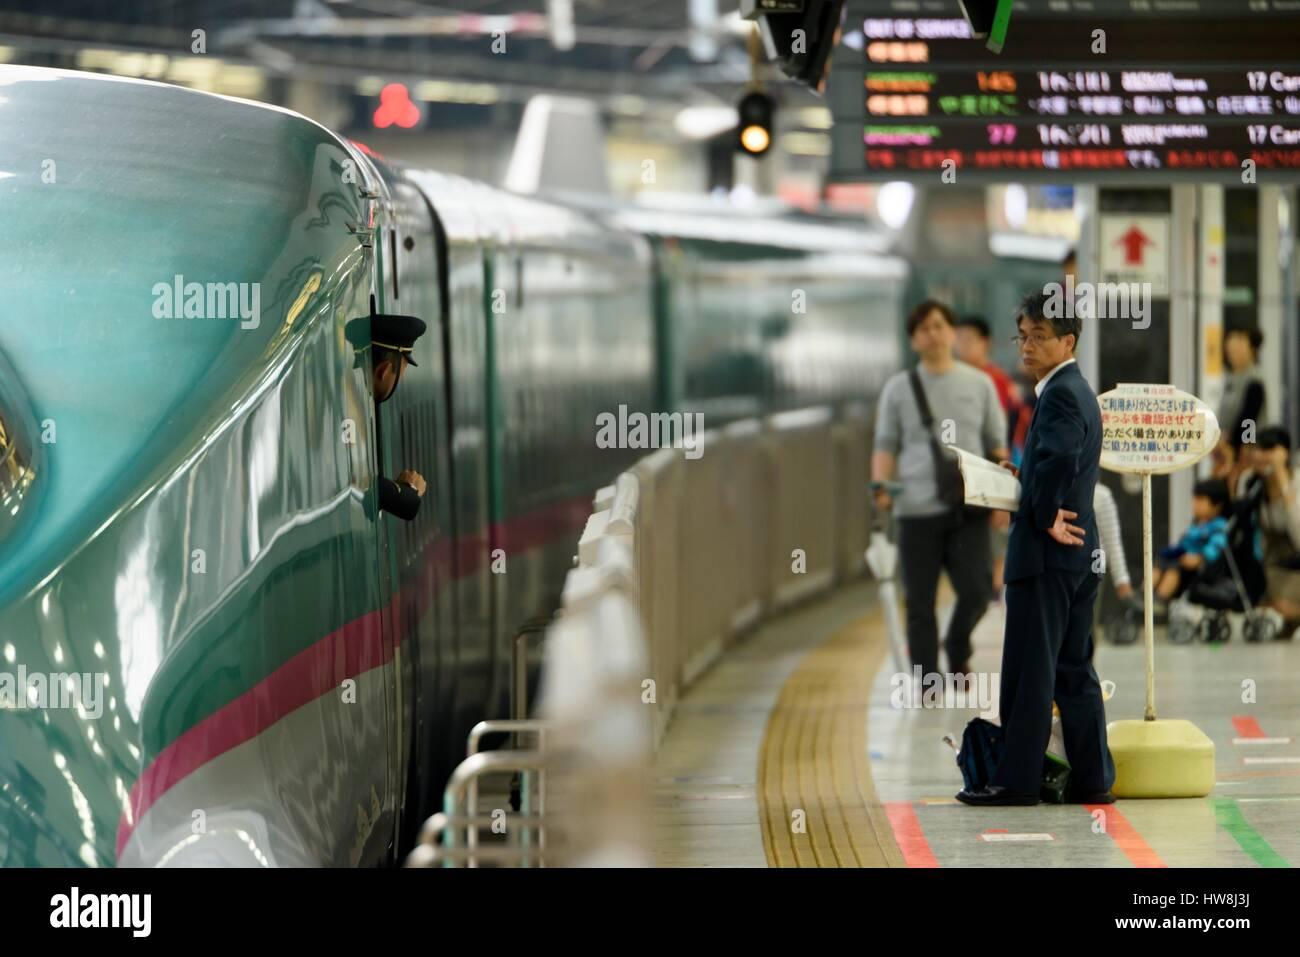 Japan, Honshu island, Tokyo, Central train station, A man to embark the Shinkansen as the train driver observes - Stock Image